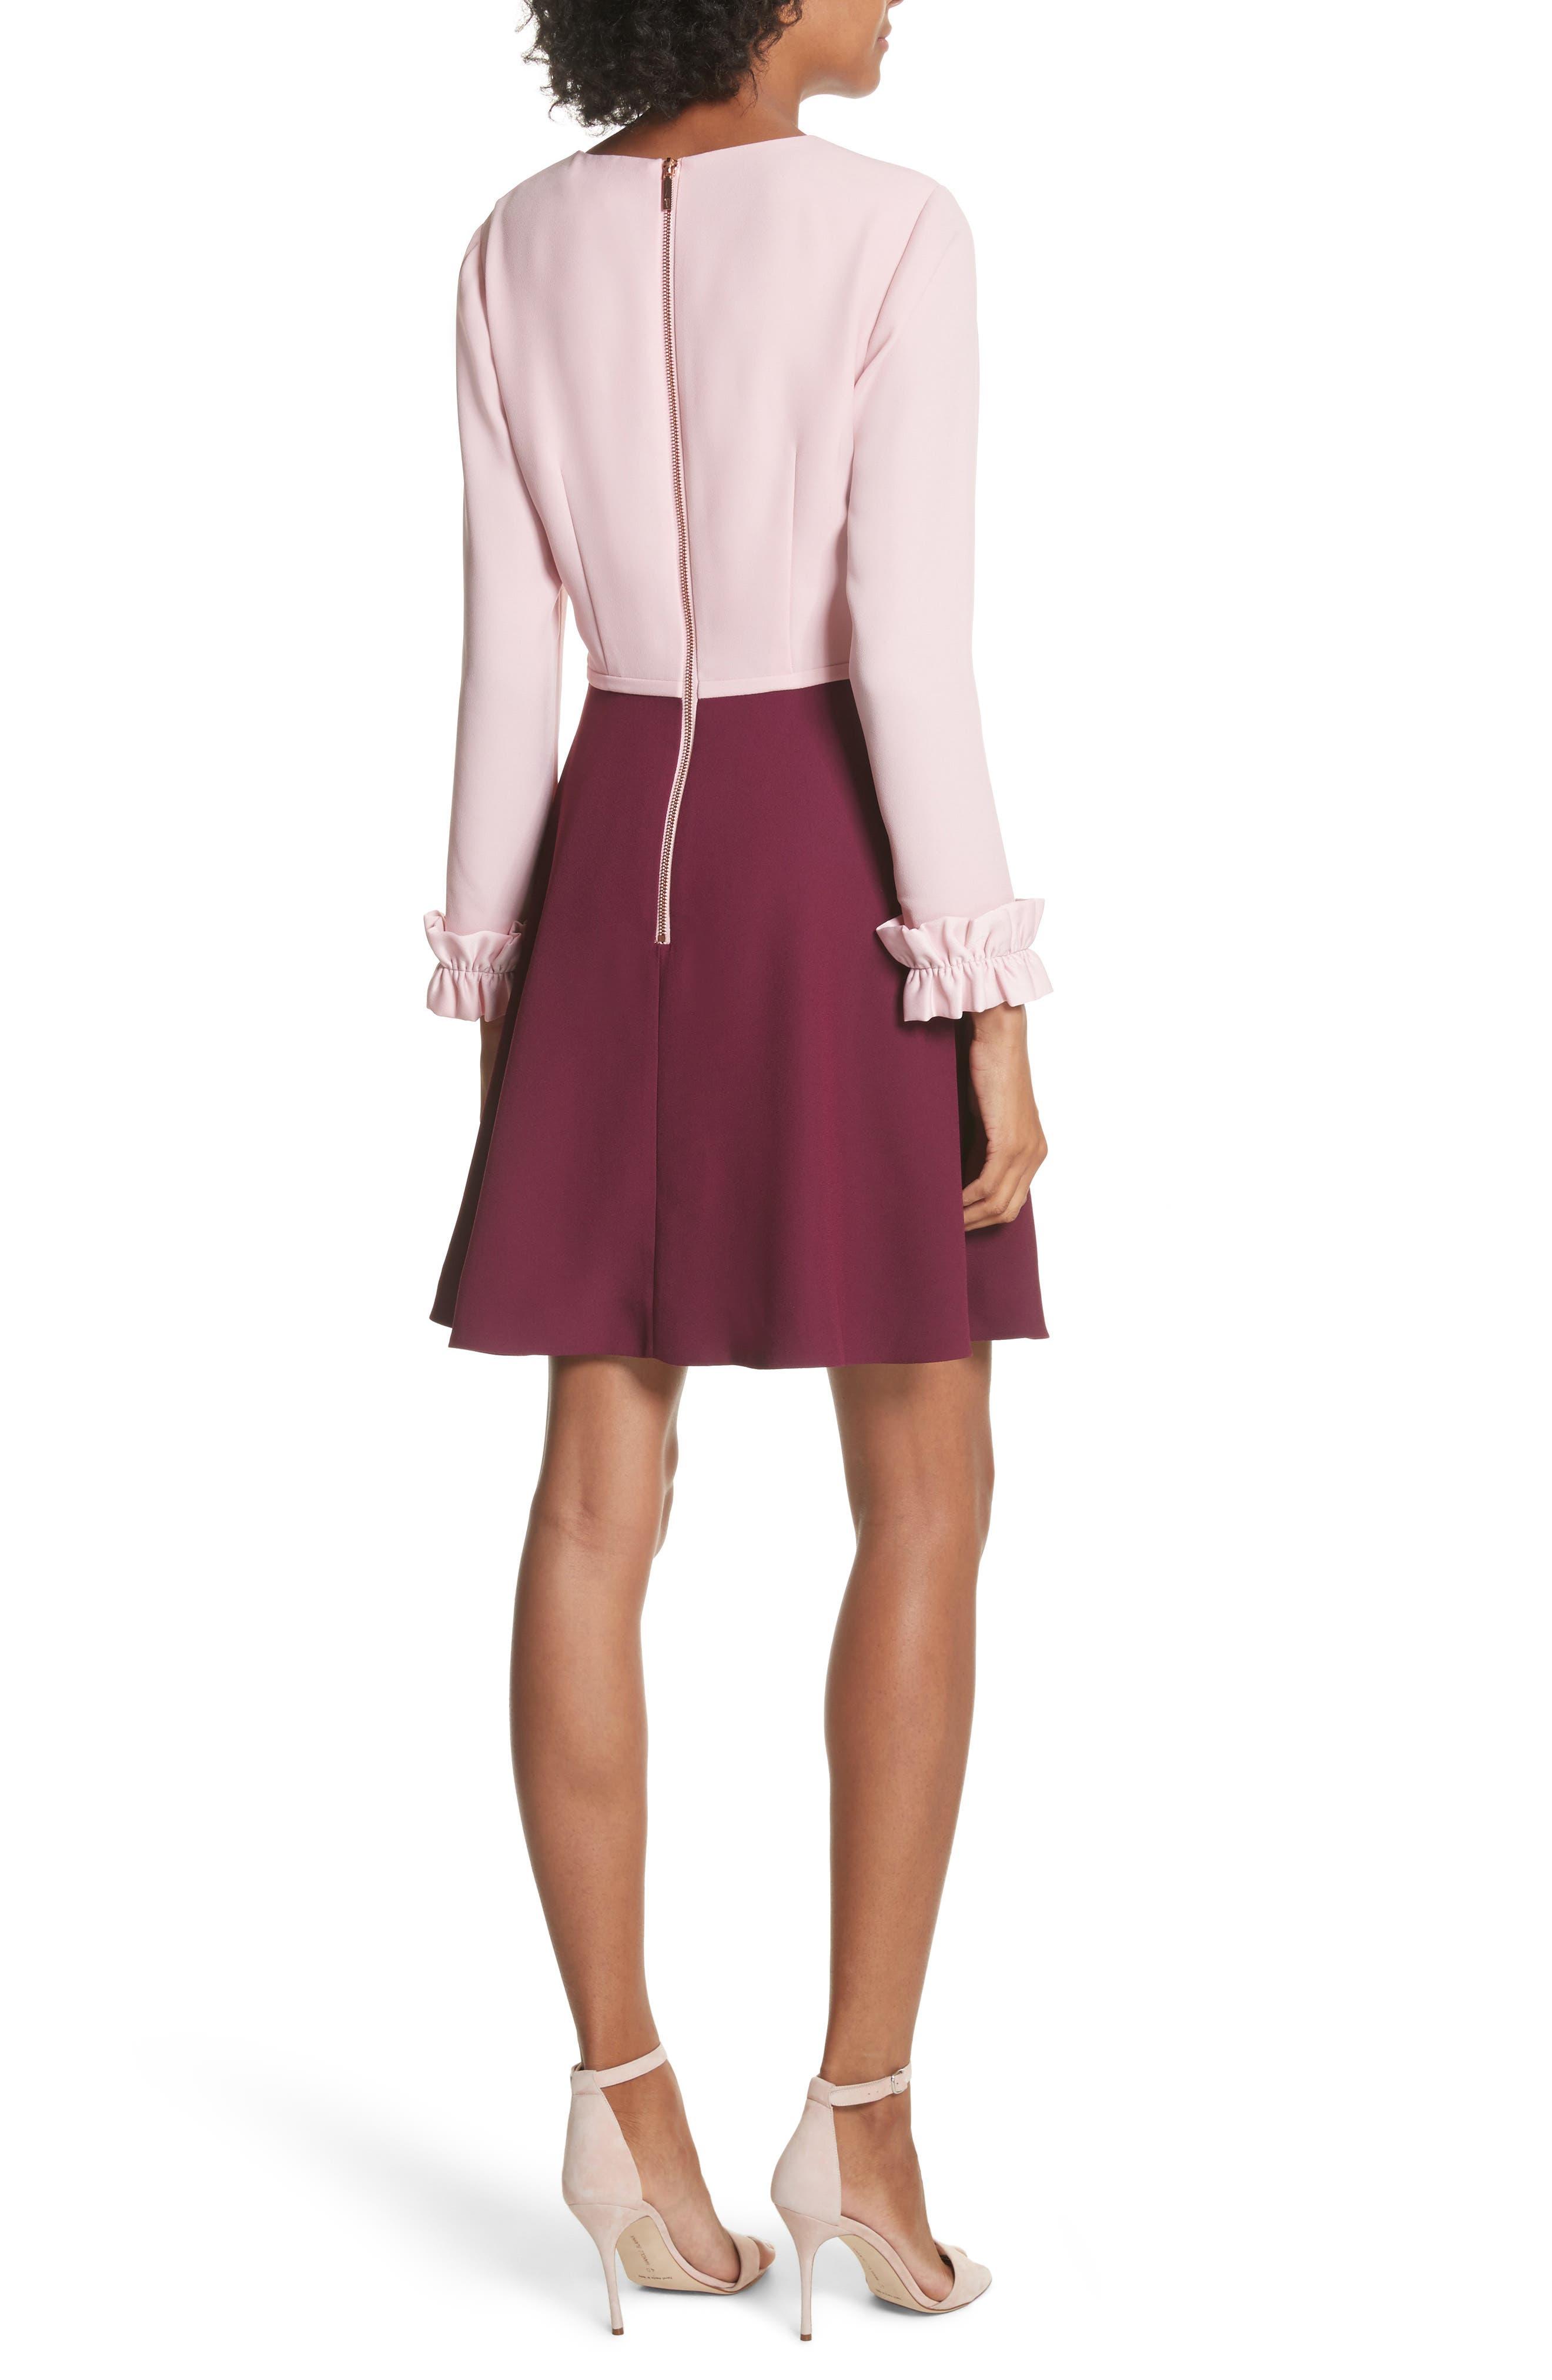 Steyla Ruffle Dress,                             Alternate thumbnail 2, color,                             Dusky Pink